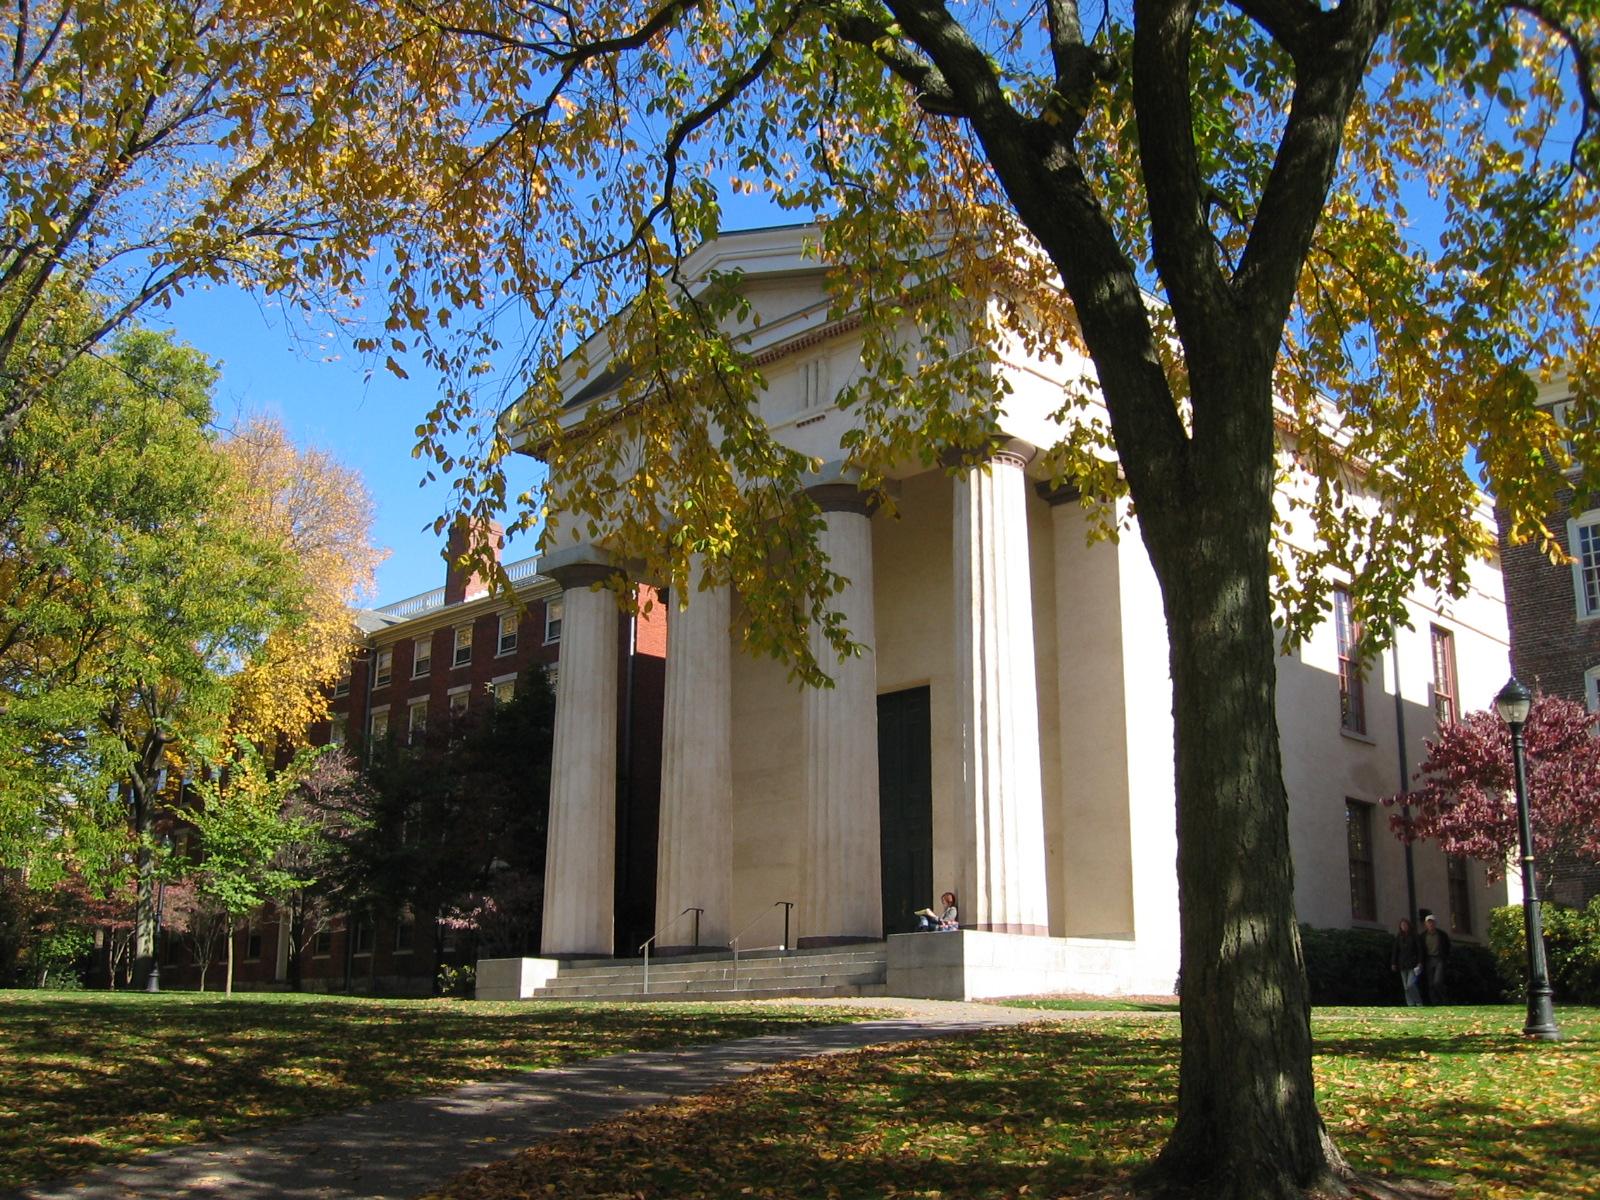 Image:Manning Chapel.jpg